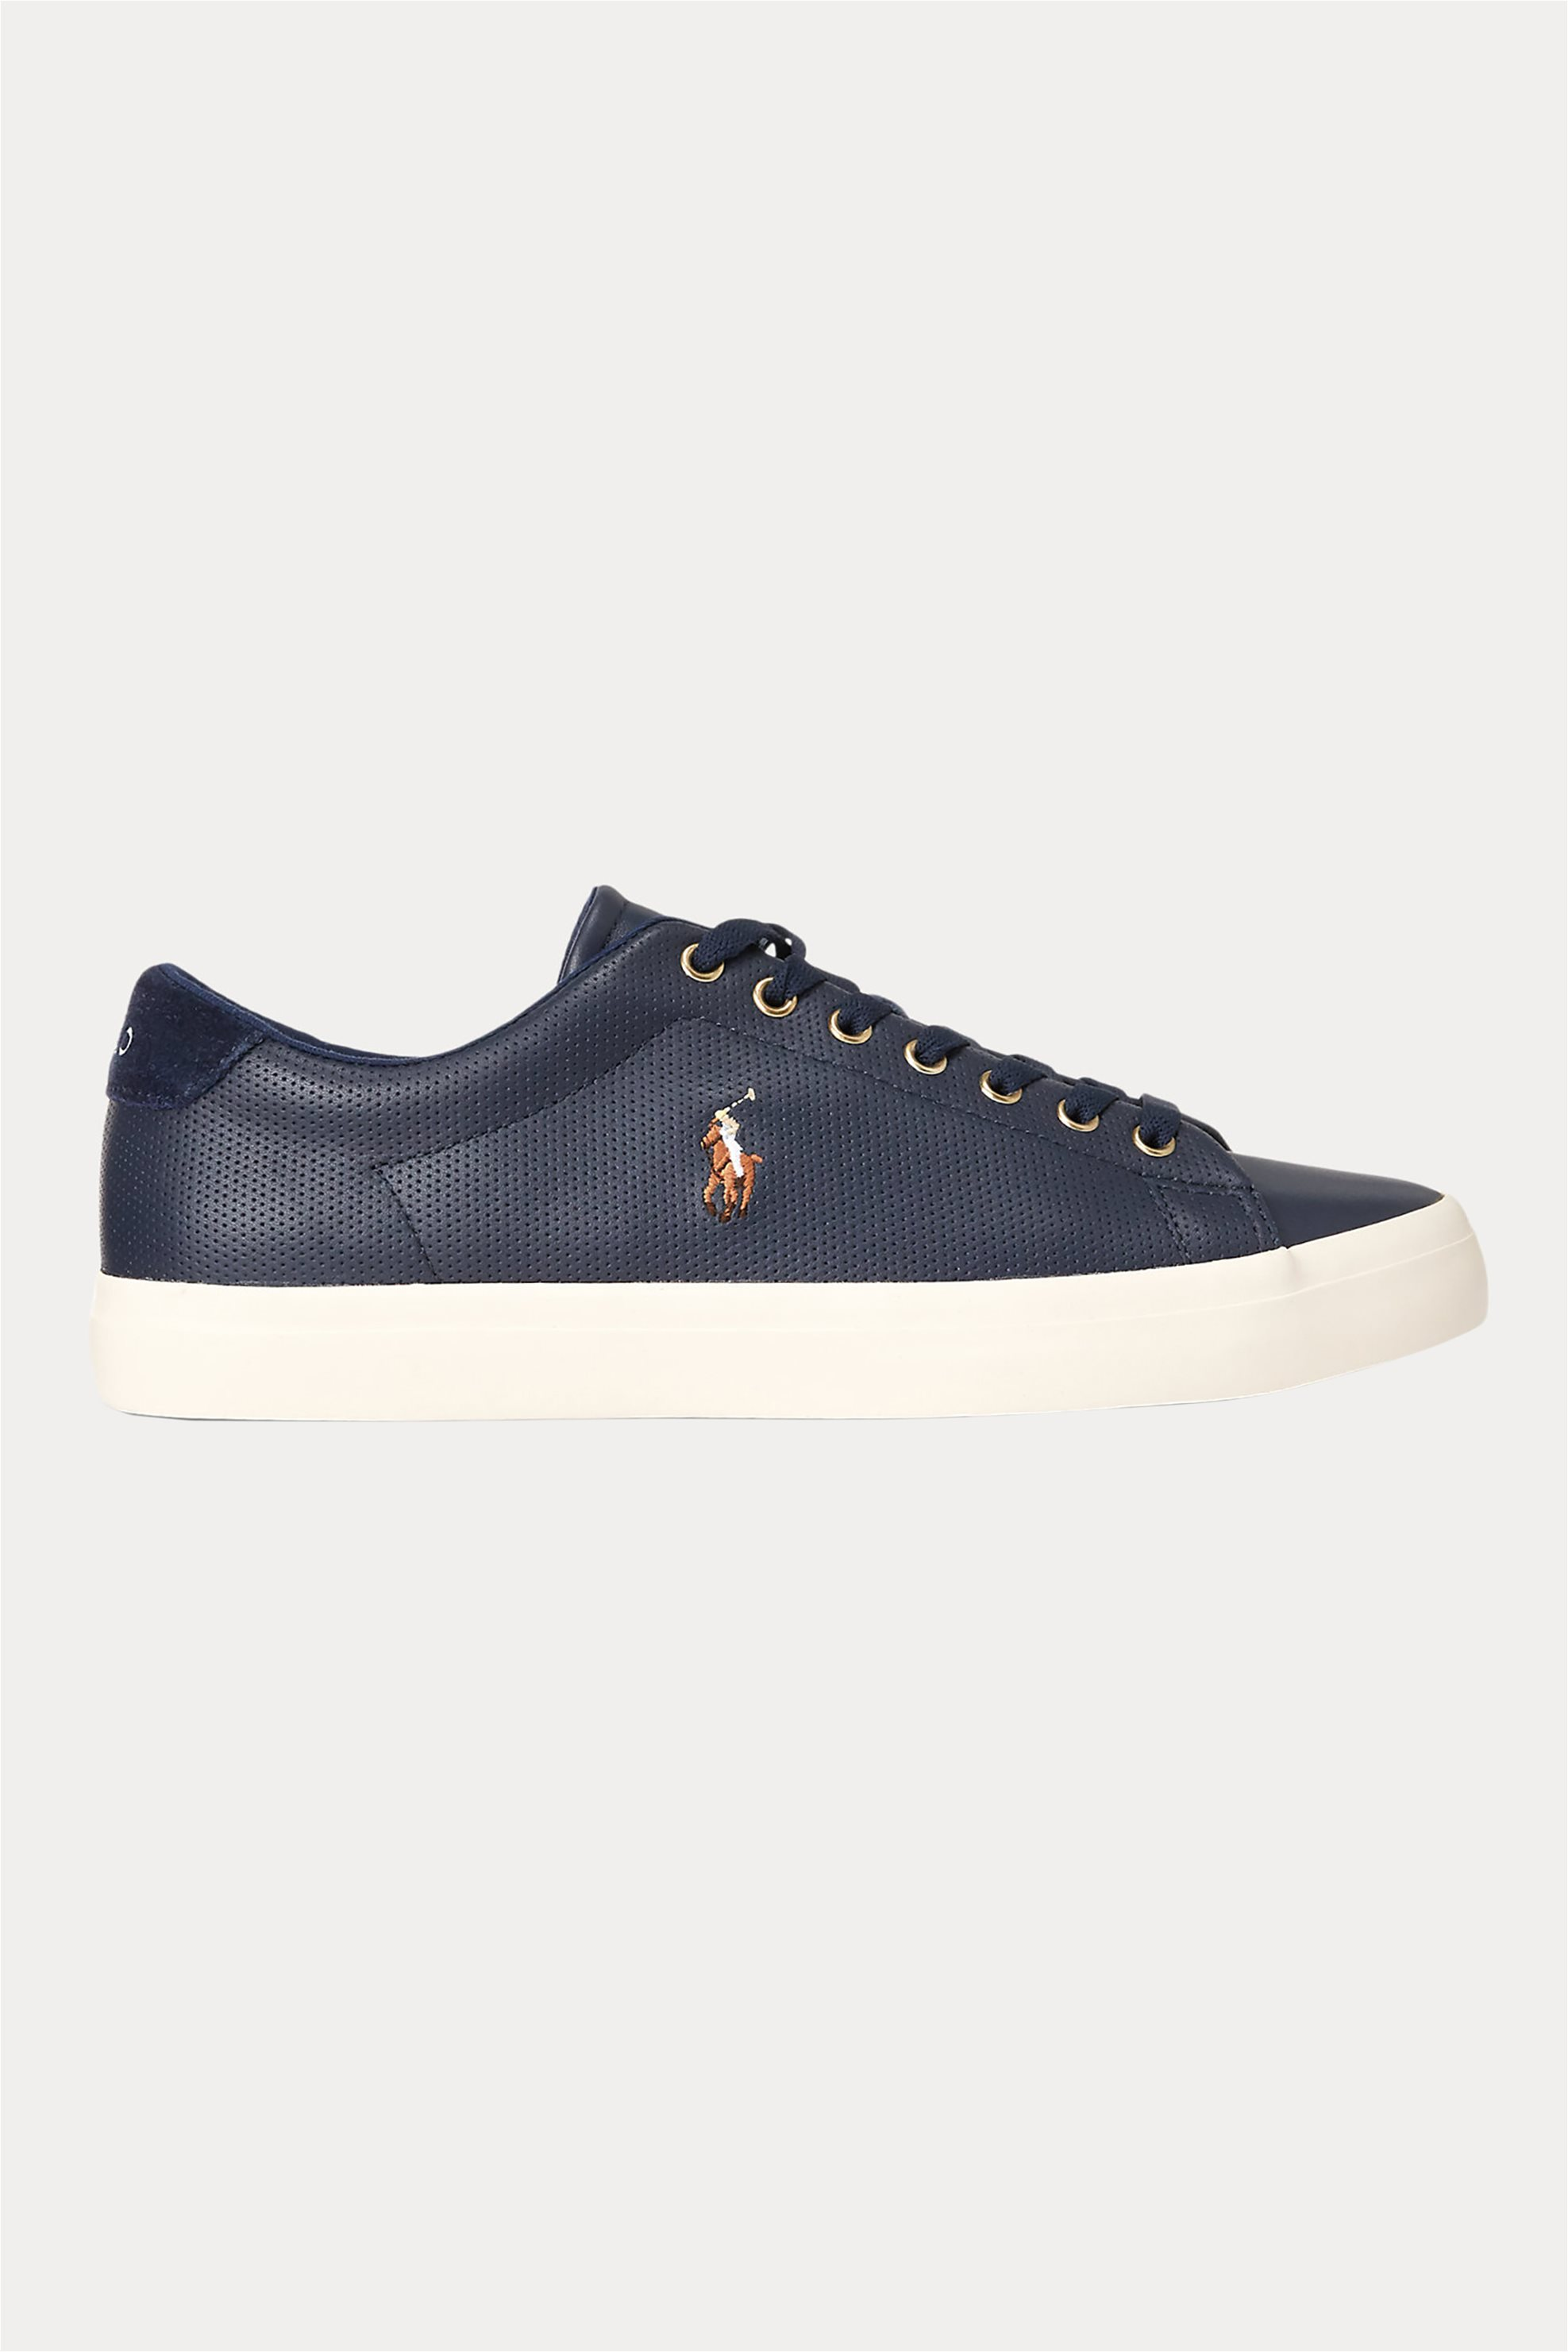 "Polo Ralph Lauren ανδρικά δερμάτινα sneakers ""Longwood"" – 816785024003 – Μπλε Σκούρο"